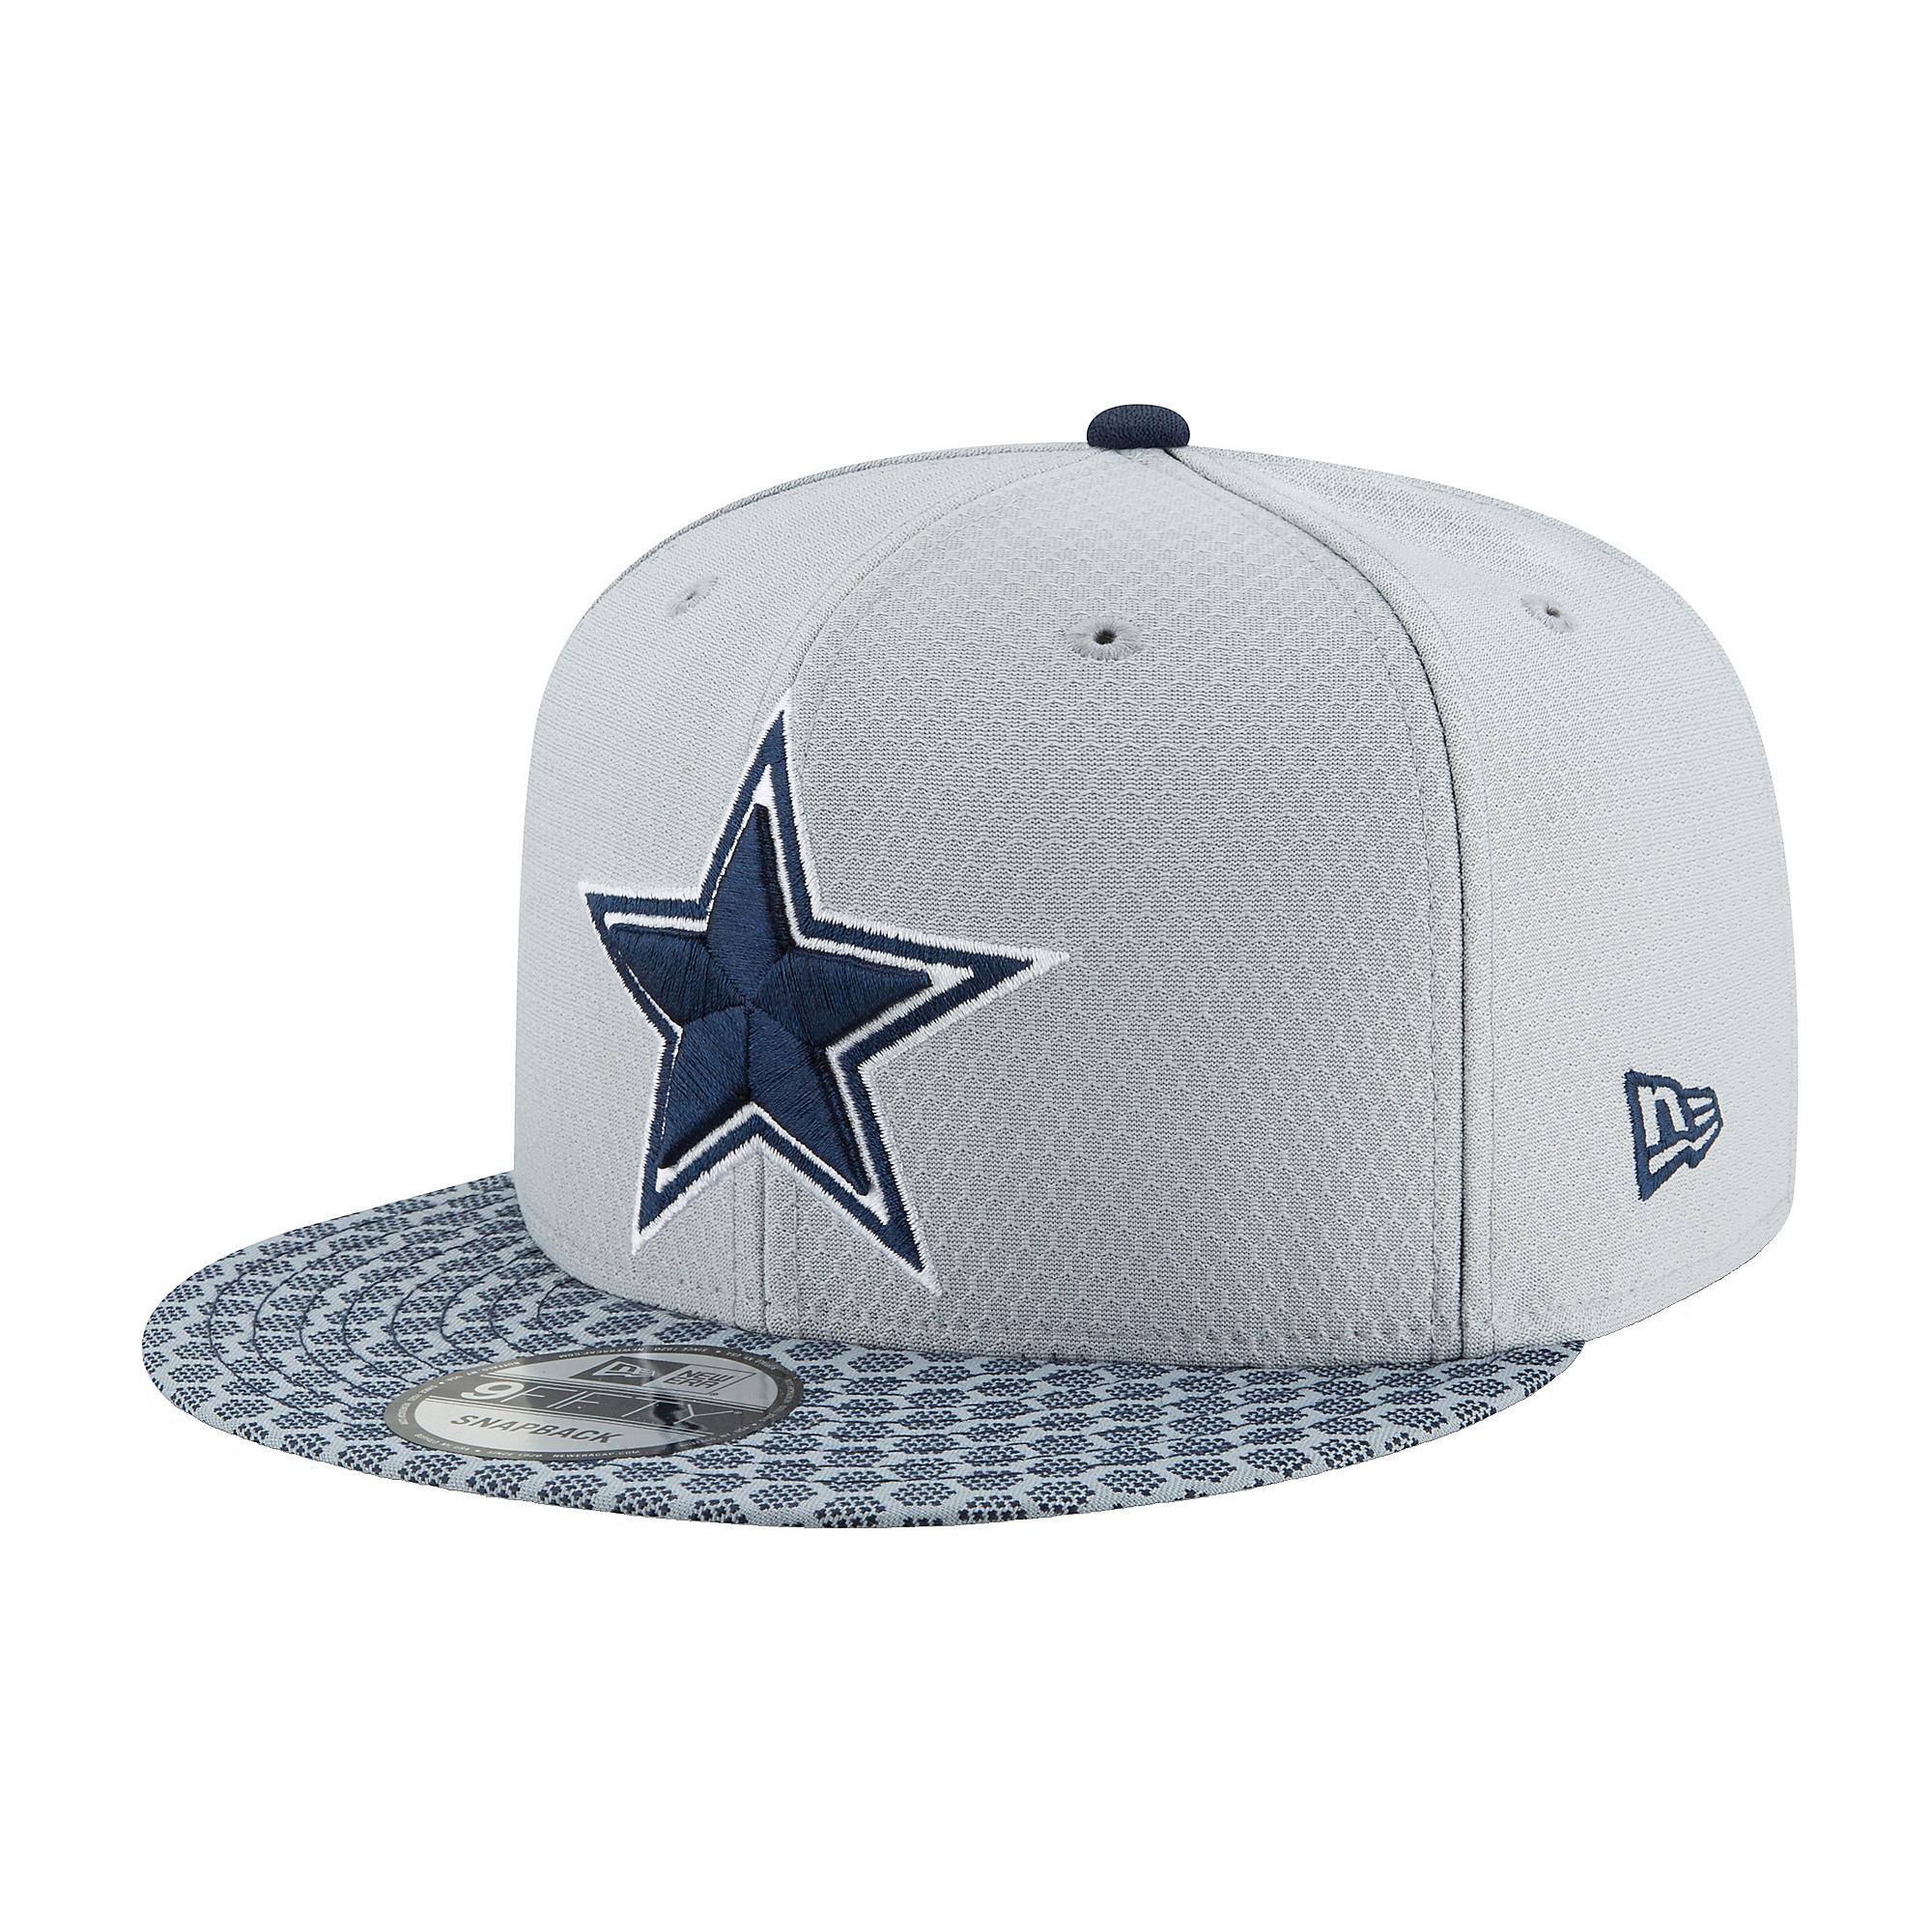 Dallas Cowboys New Era Youth Sideline 9Fifty Cap